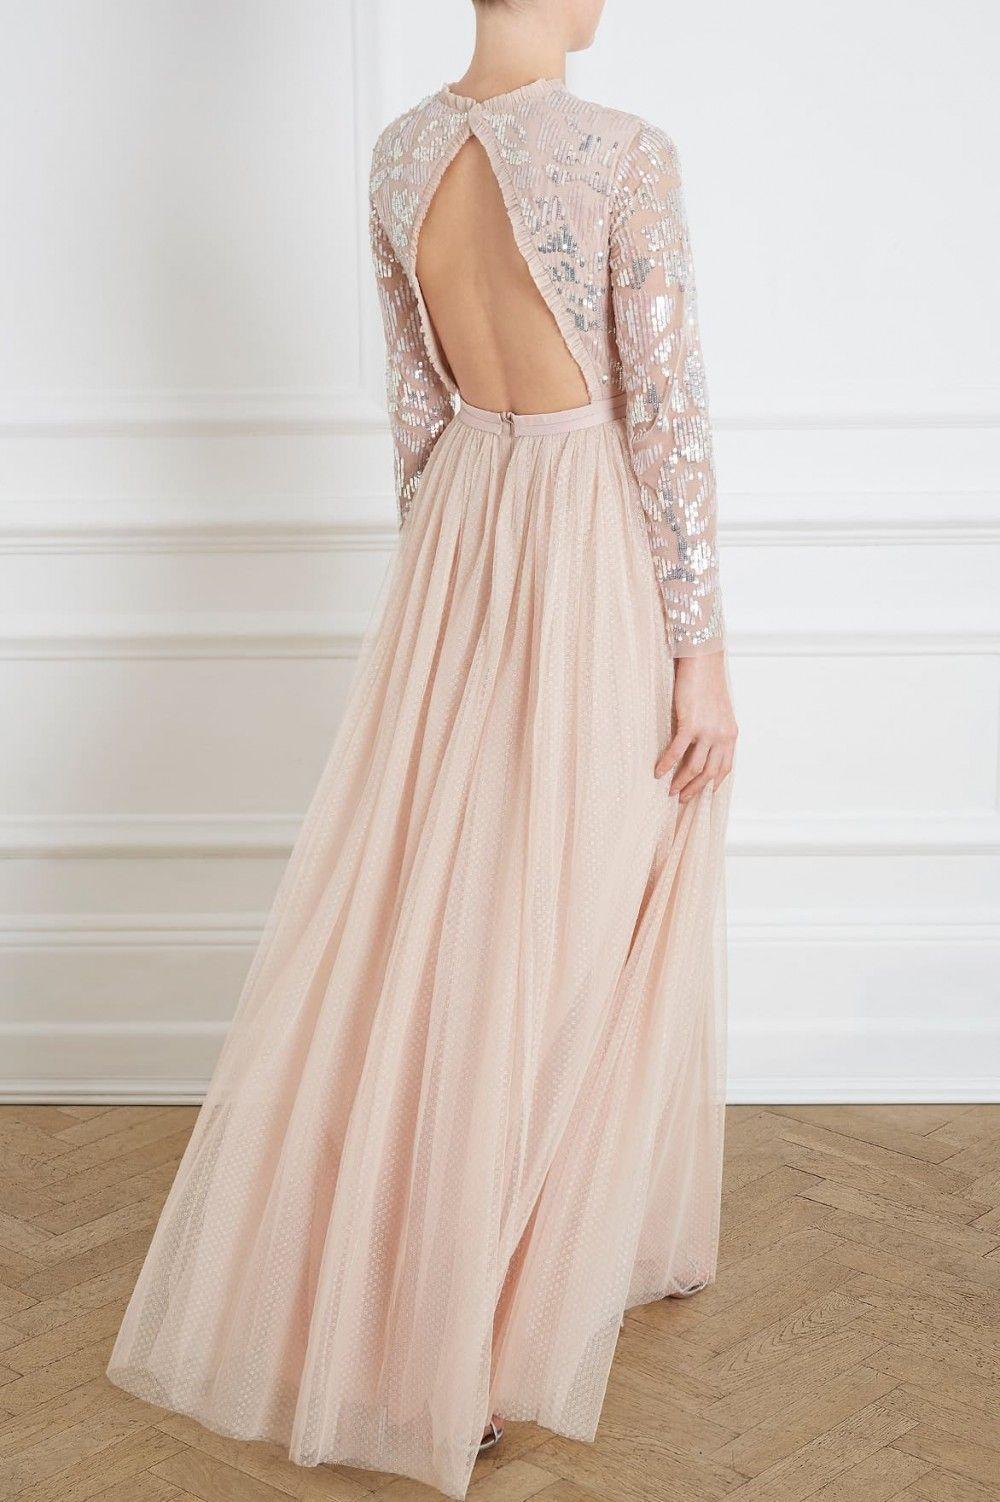 Needle And Thread 2019 Floral Gloss Bodice Maxi Dress Black Tie Wedding Guest Dress Black Tie Wedding Guest Dress Summer Elegant Evening Dresses Long [ 1502 x 1000 Pixel ]